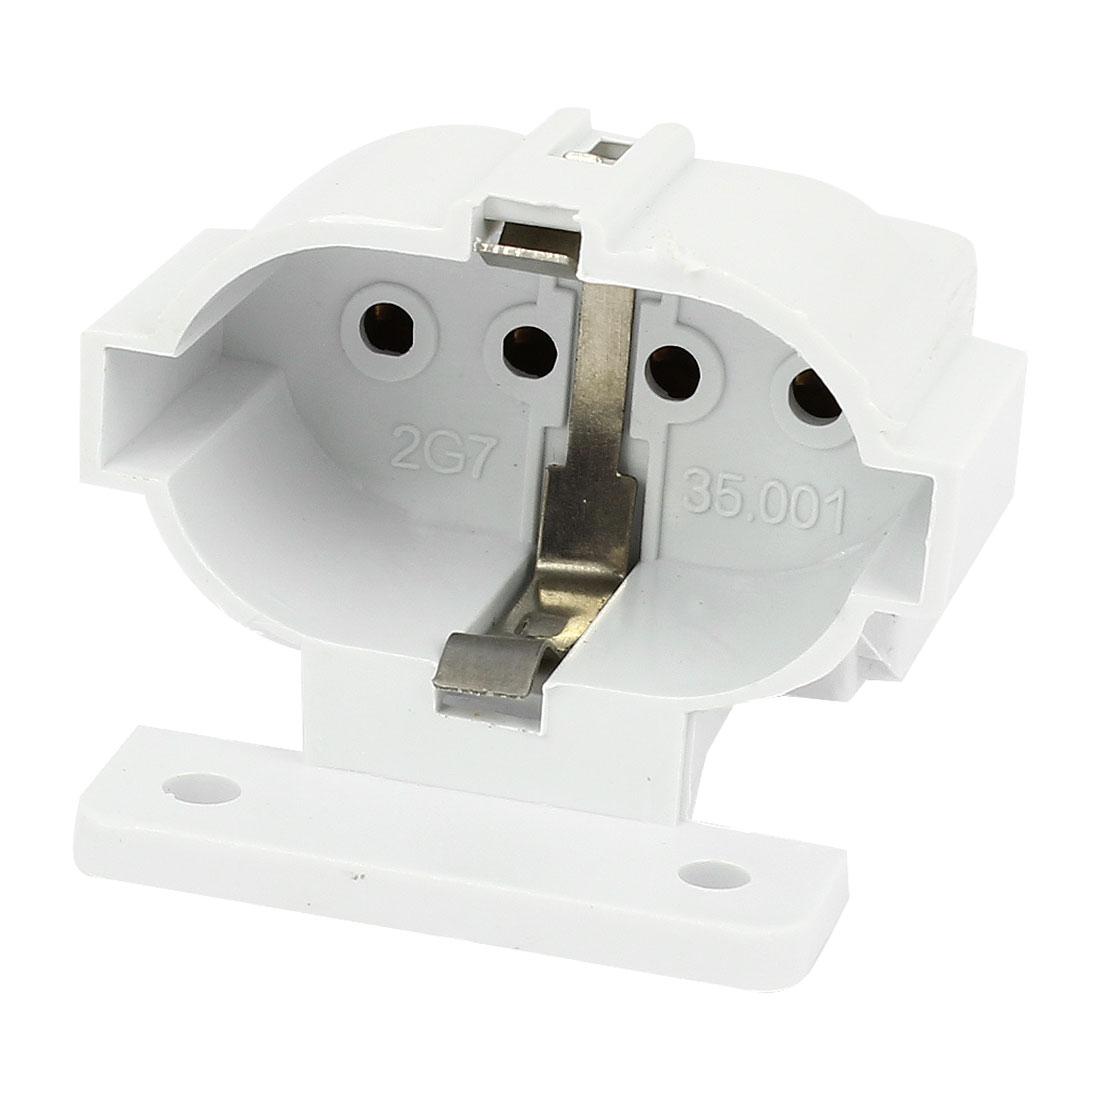 AC 250V 2A 4-pin 2G7 Socket Energy Saving Lamp Holder Adapter